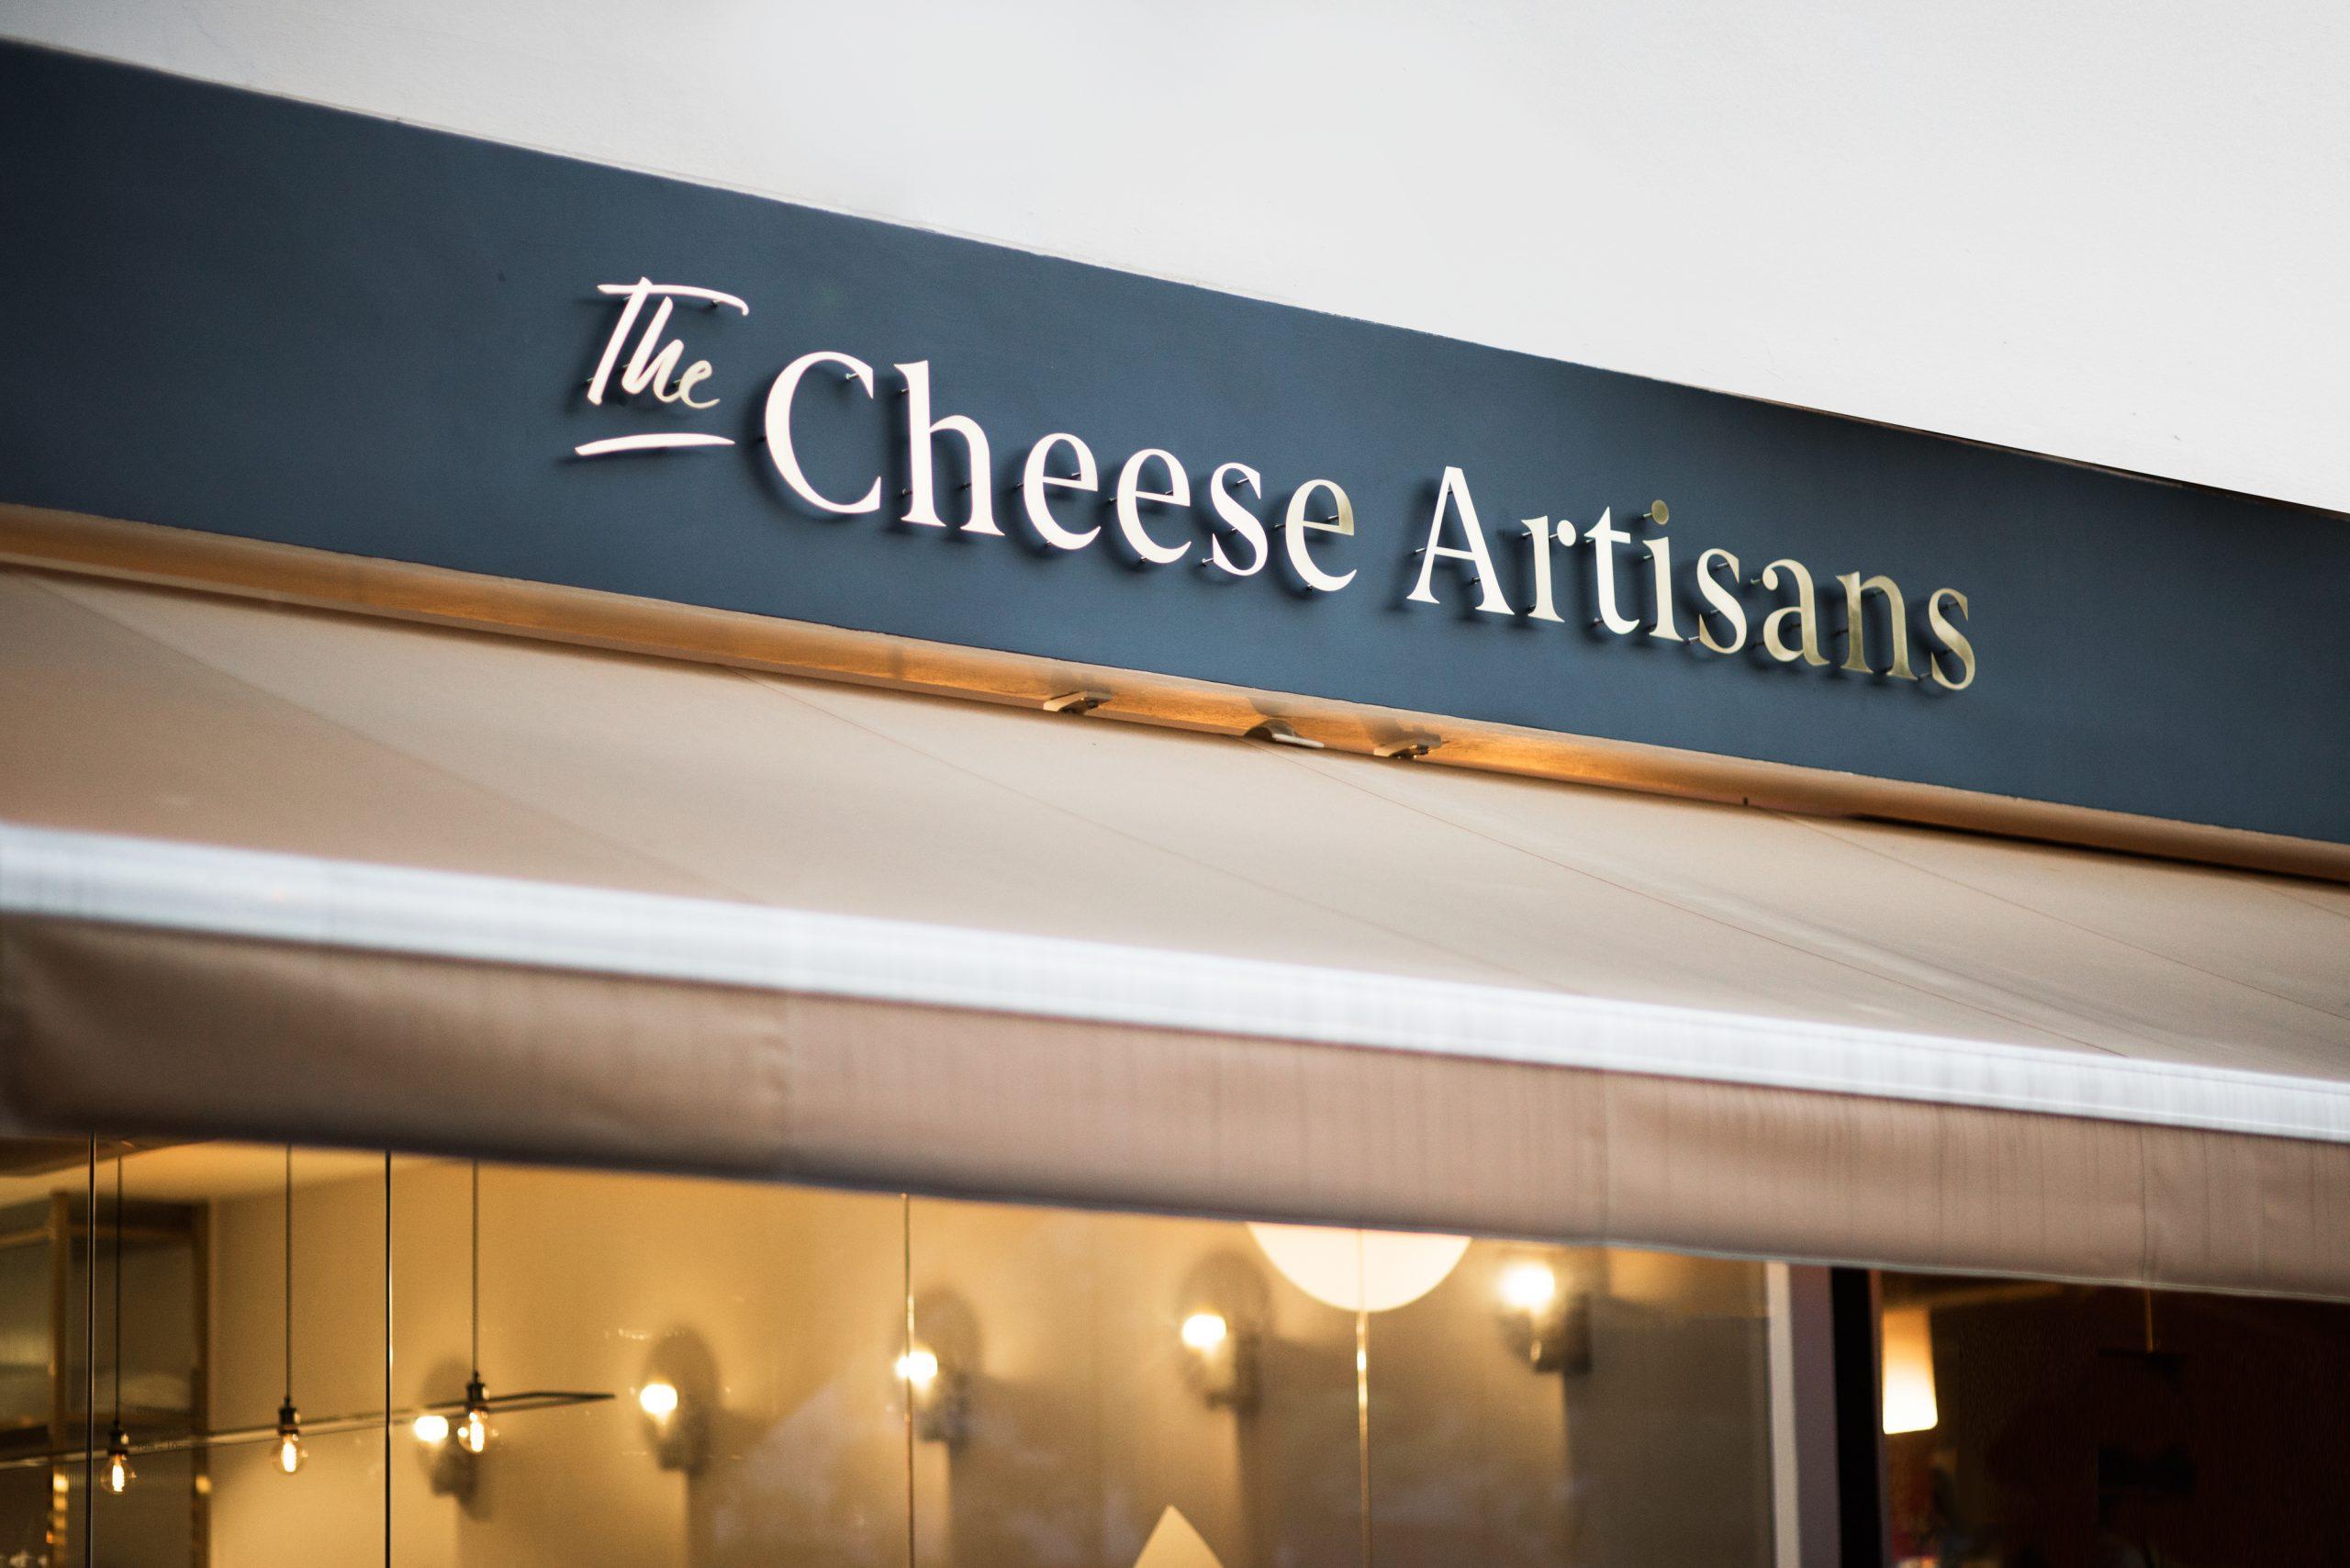 The Cheese Artisans